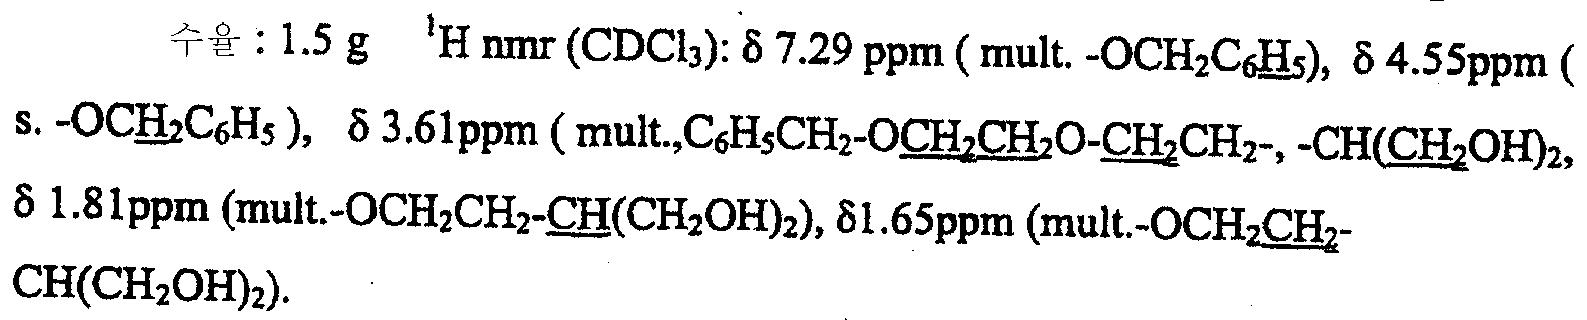 Figure 112004019249700-pct00016